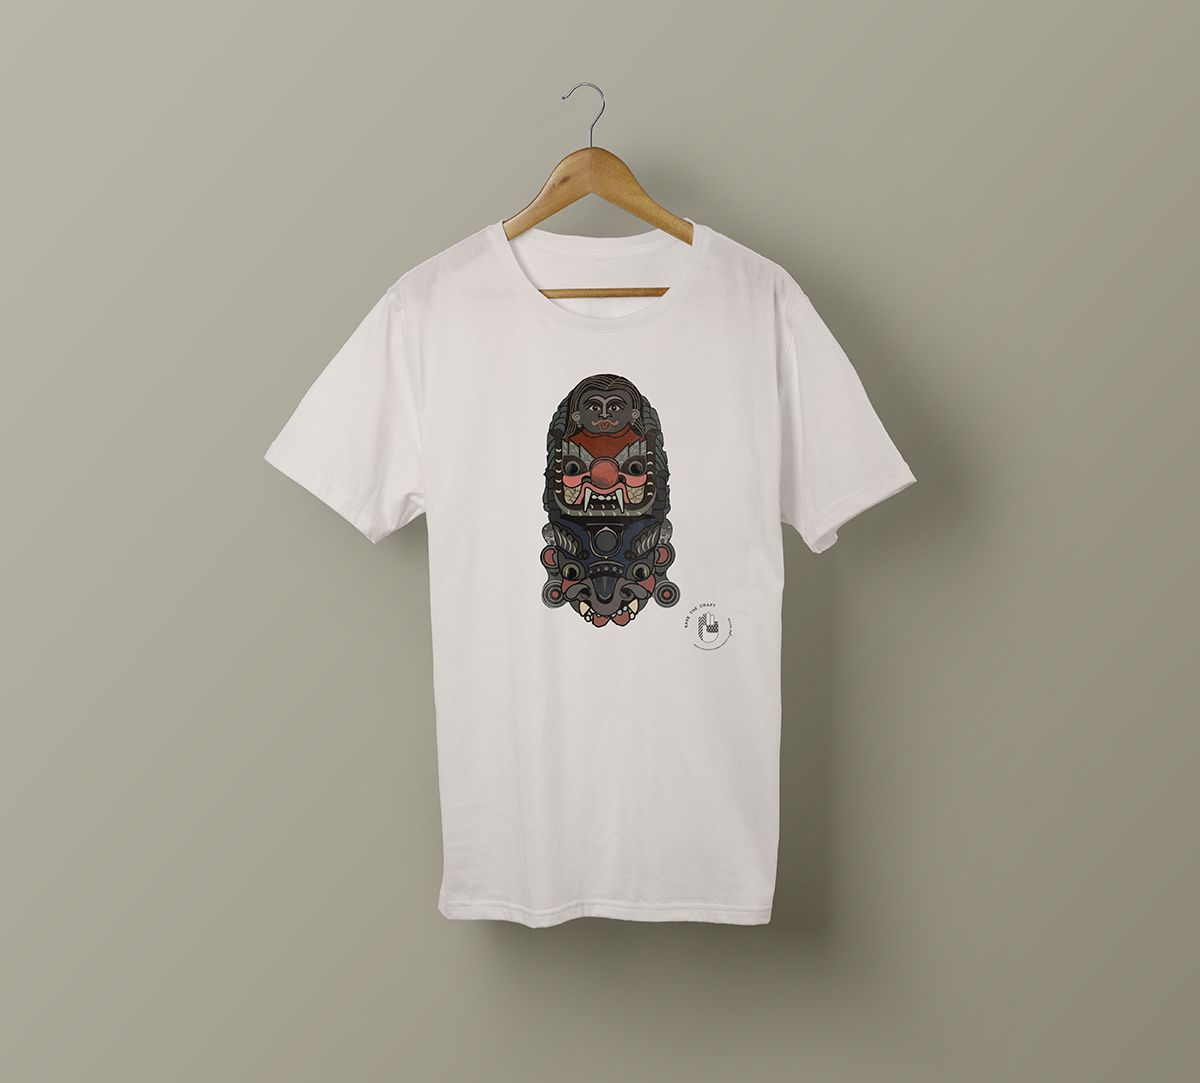 India Circus by Krsnaa Mehta Bhairav's wrath Unisex Extra Small T-Shirt